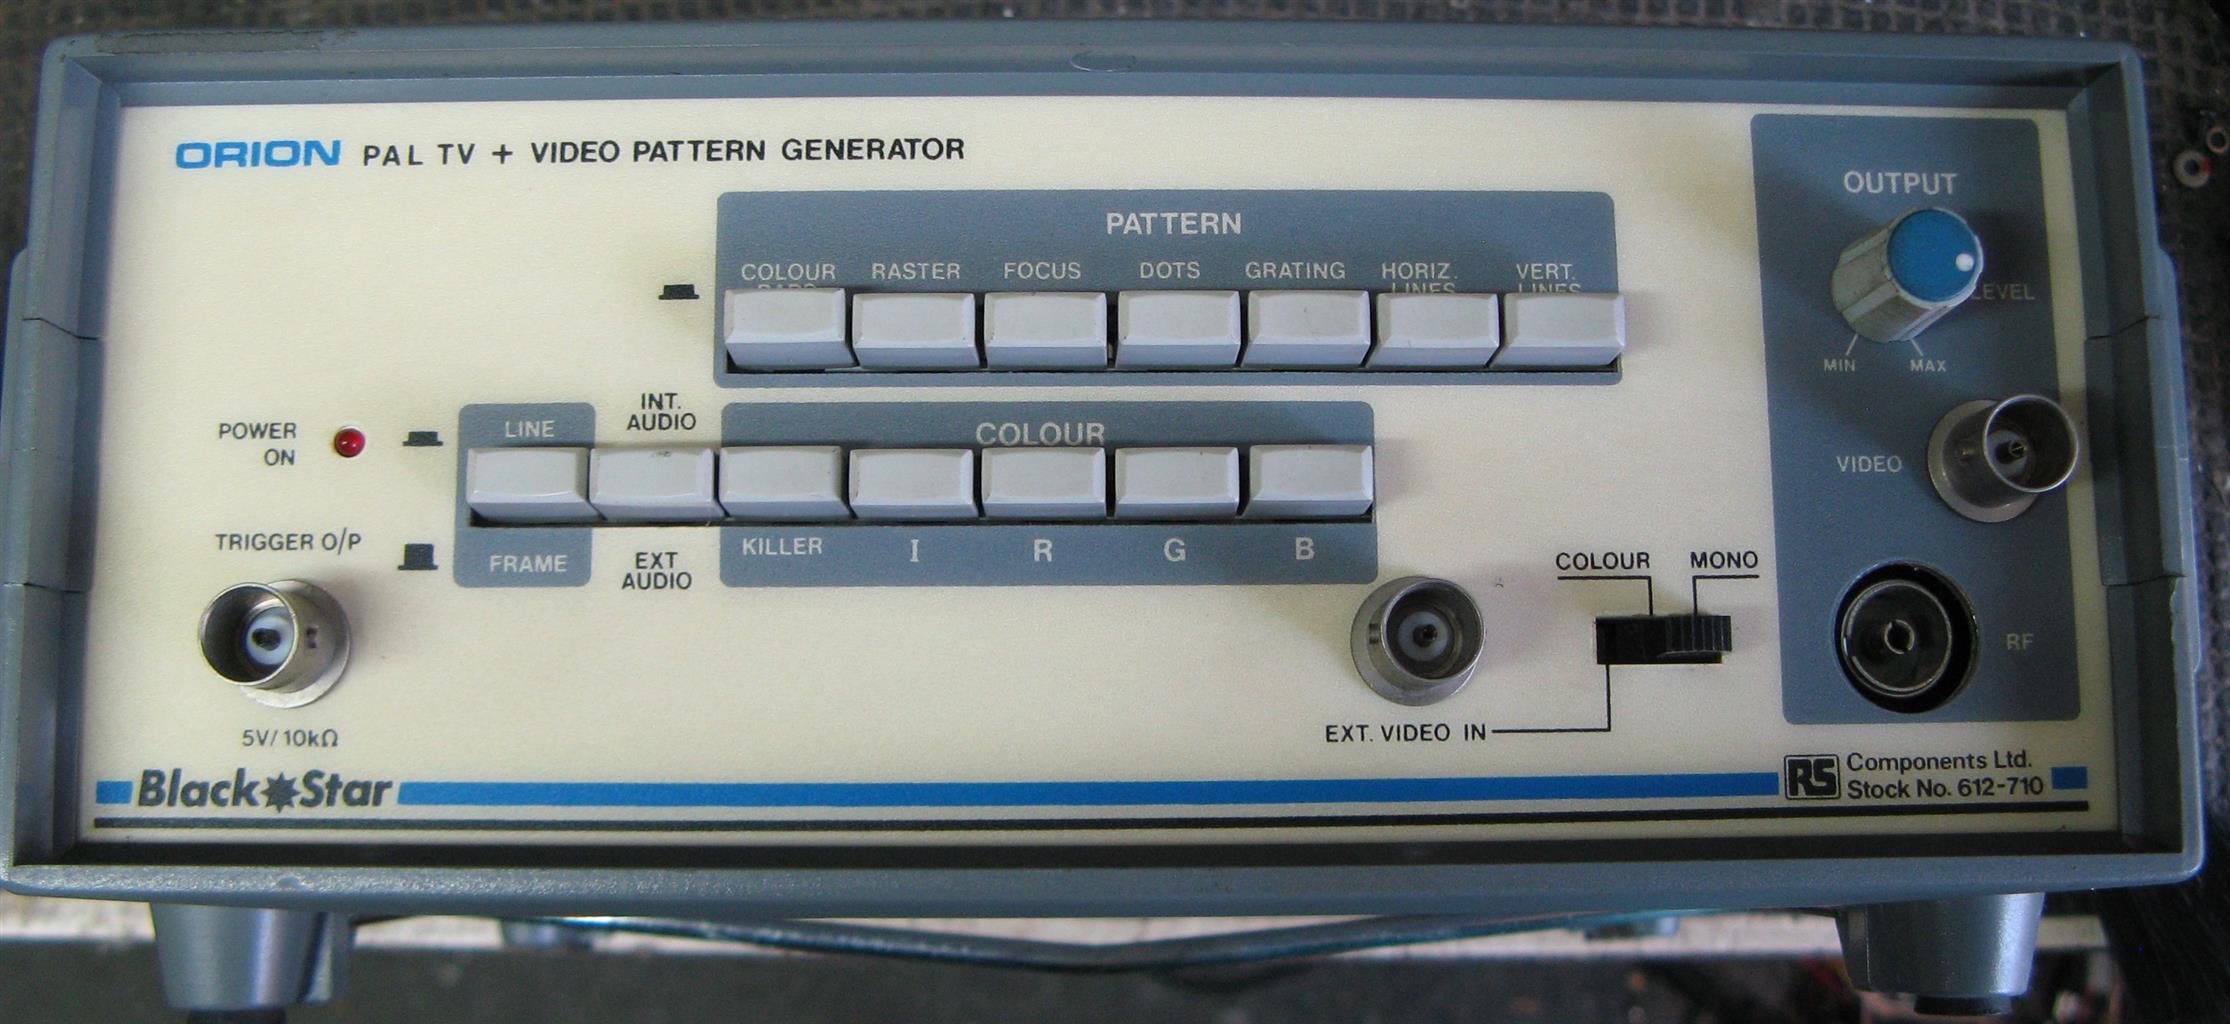 Blackstar Video signal generator